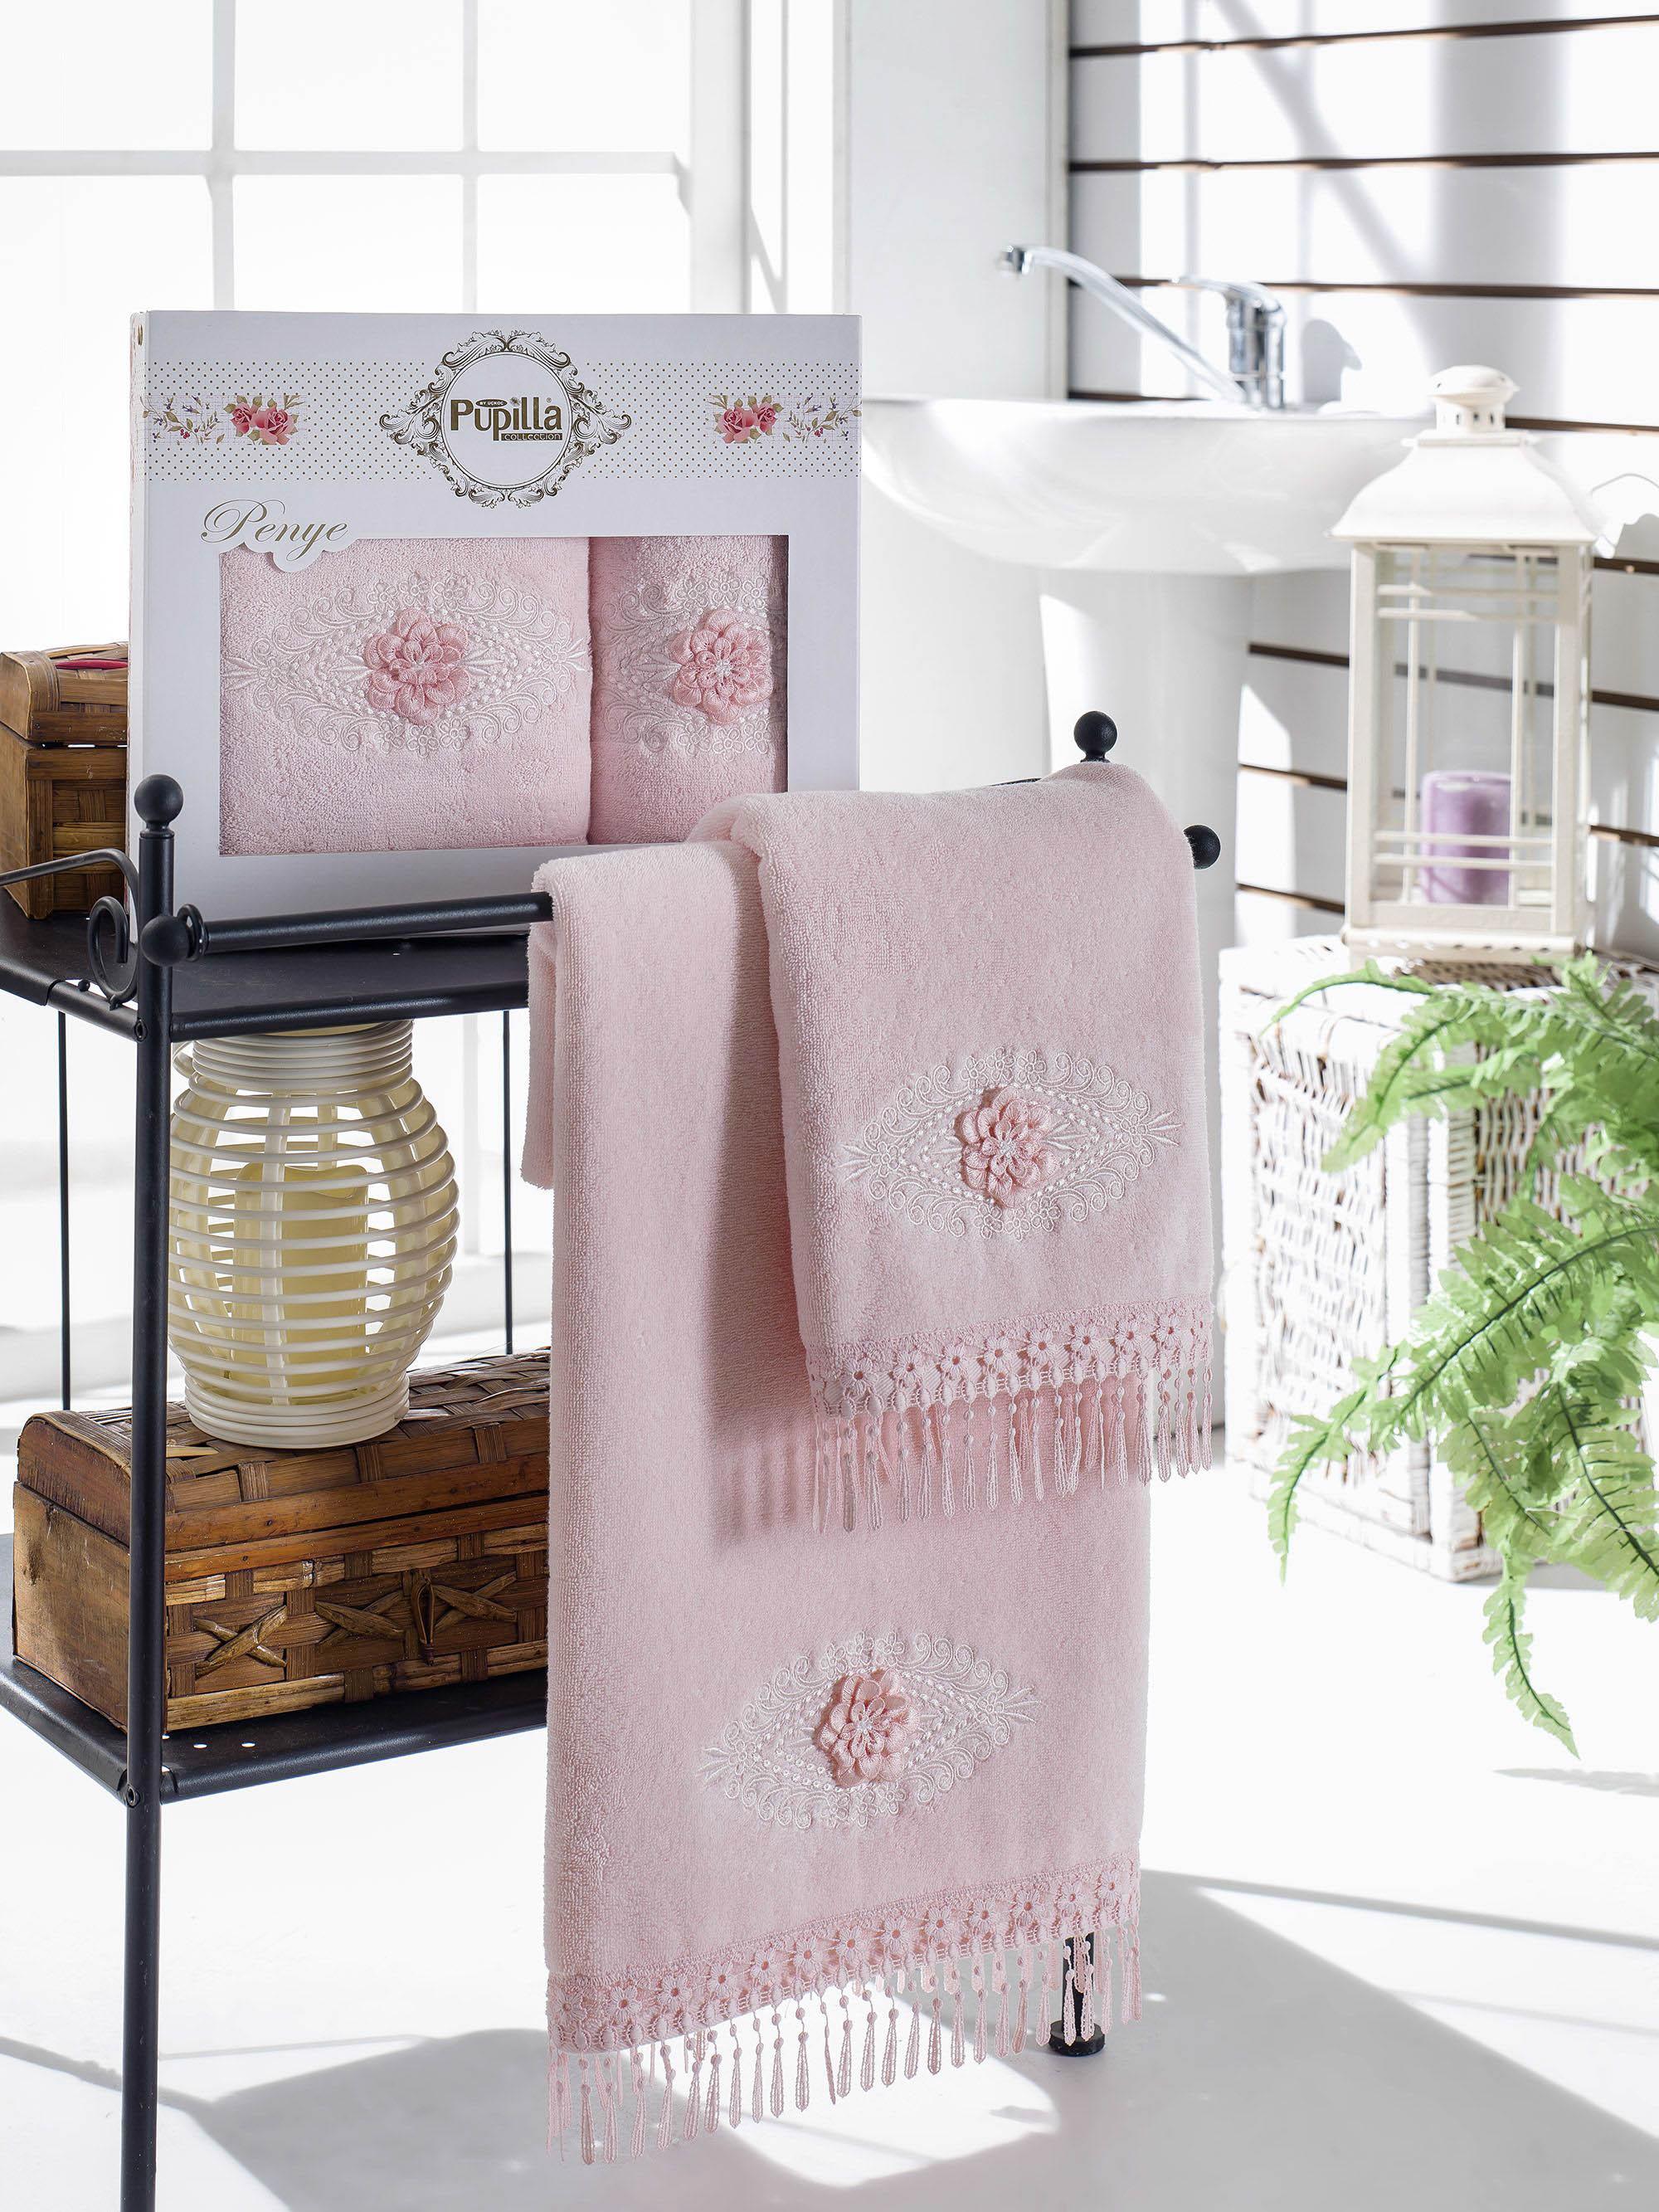 Полотенца Pupilla Набор из 2 полотенец Stil Цвет: Розовый набор из 3 полотенец merzuka sakura 50х90 2 70х140 8432 терракотовый